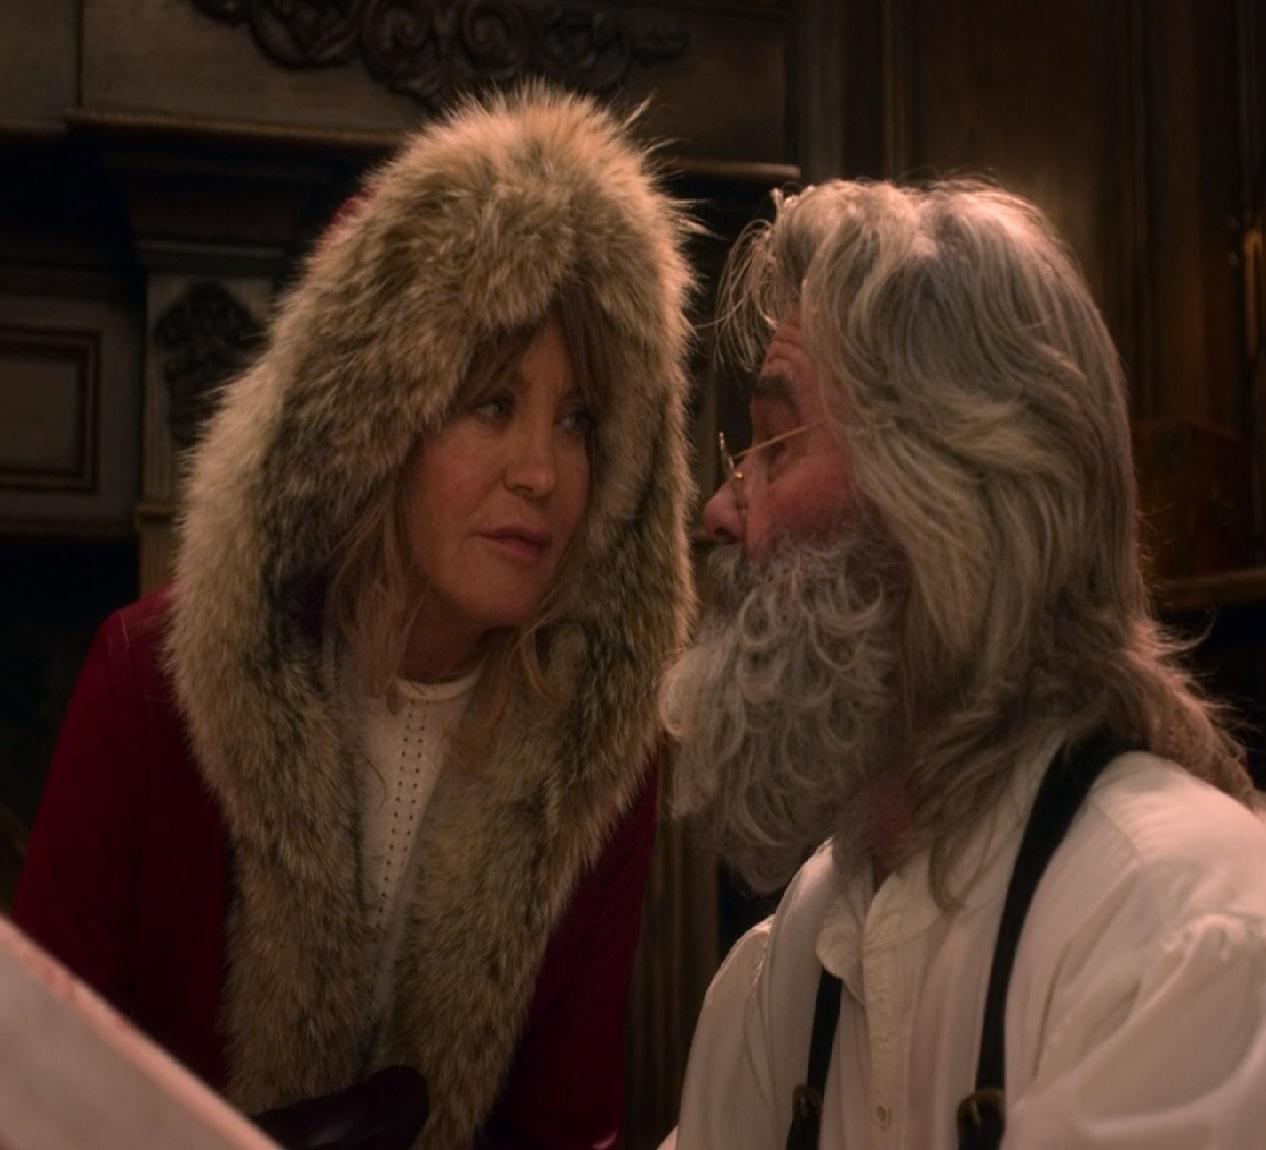 Christmas Chronicles Mrs Claus.Neko Random The Christmas Chronicles 2018 Film Review